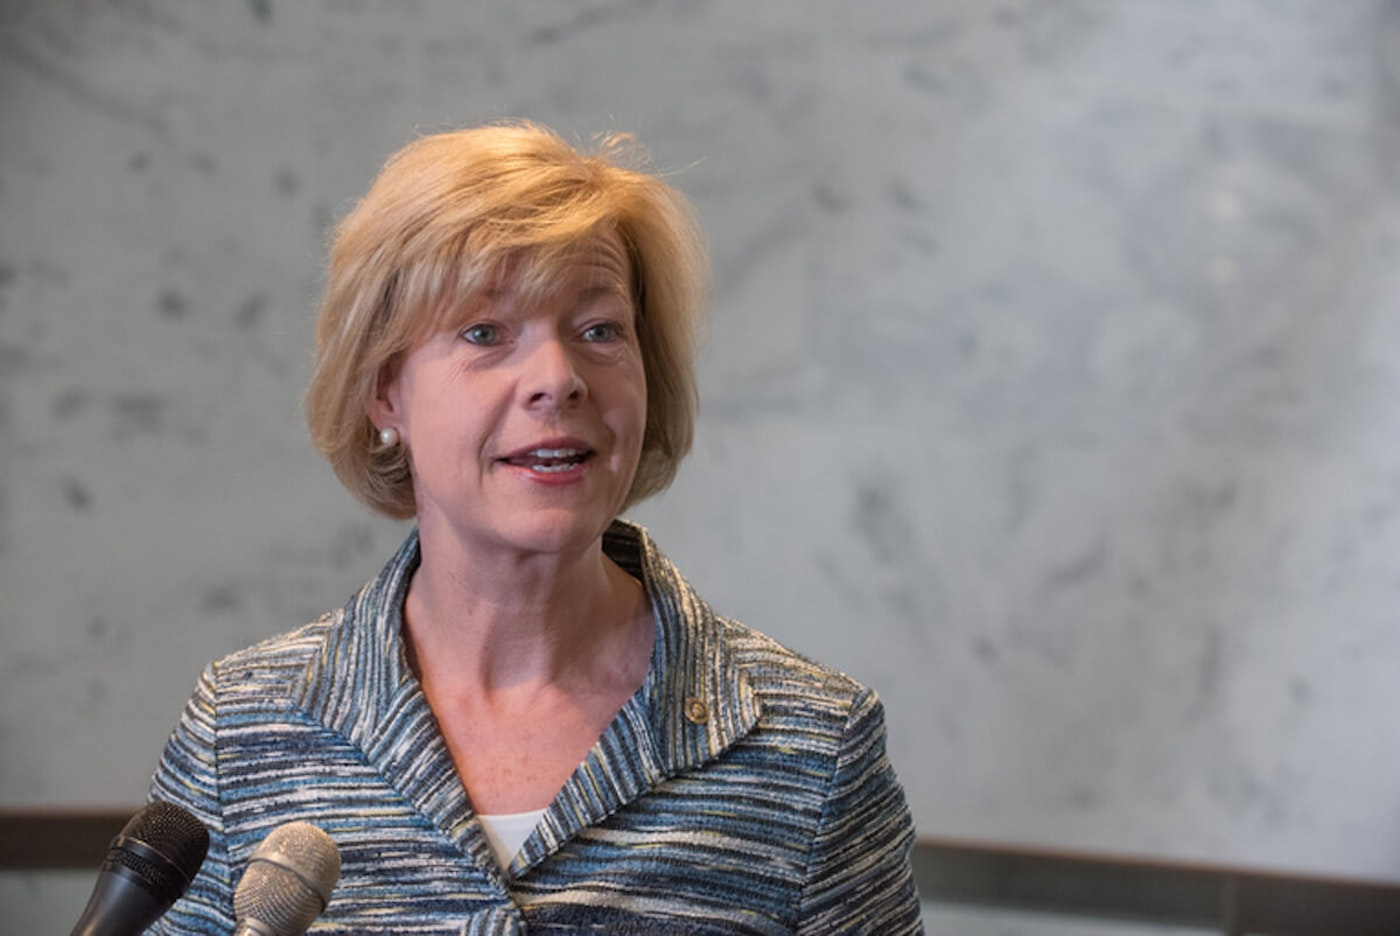 Sen. Baldwin Has A Three-Part Plan To Help Struggling Wisconsinites. Here's What's In It.